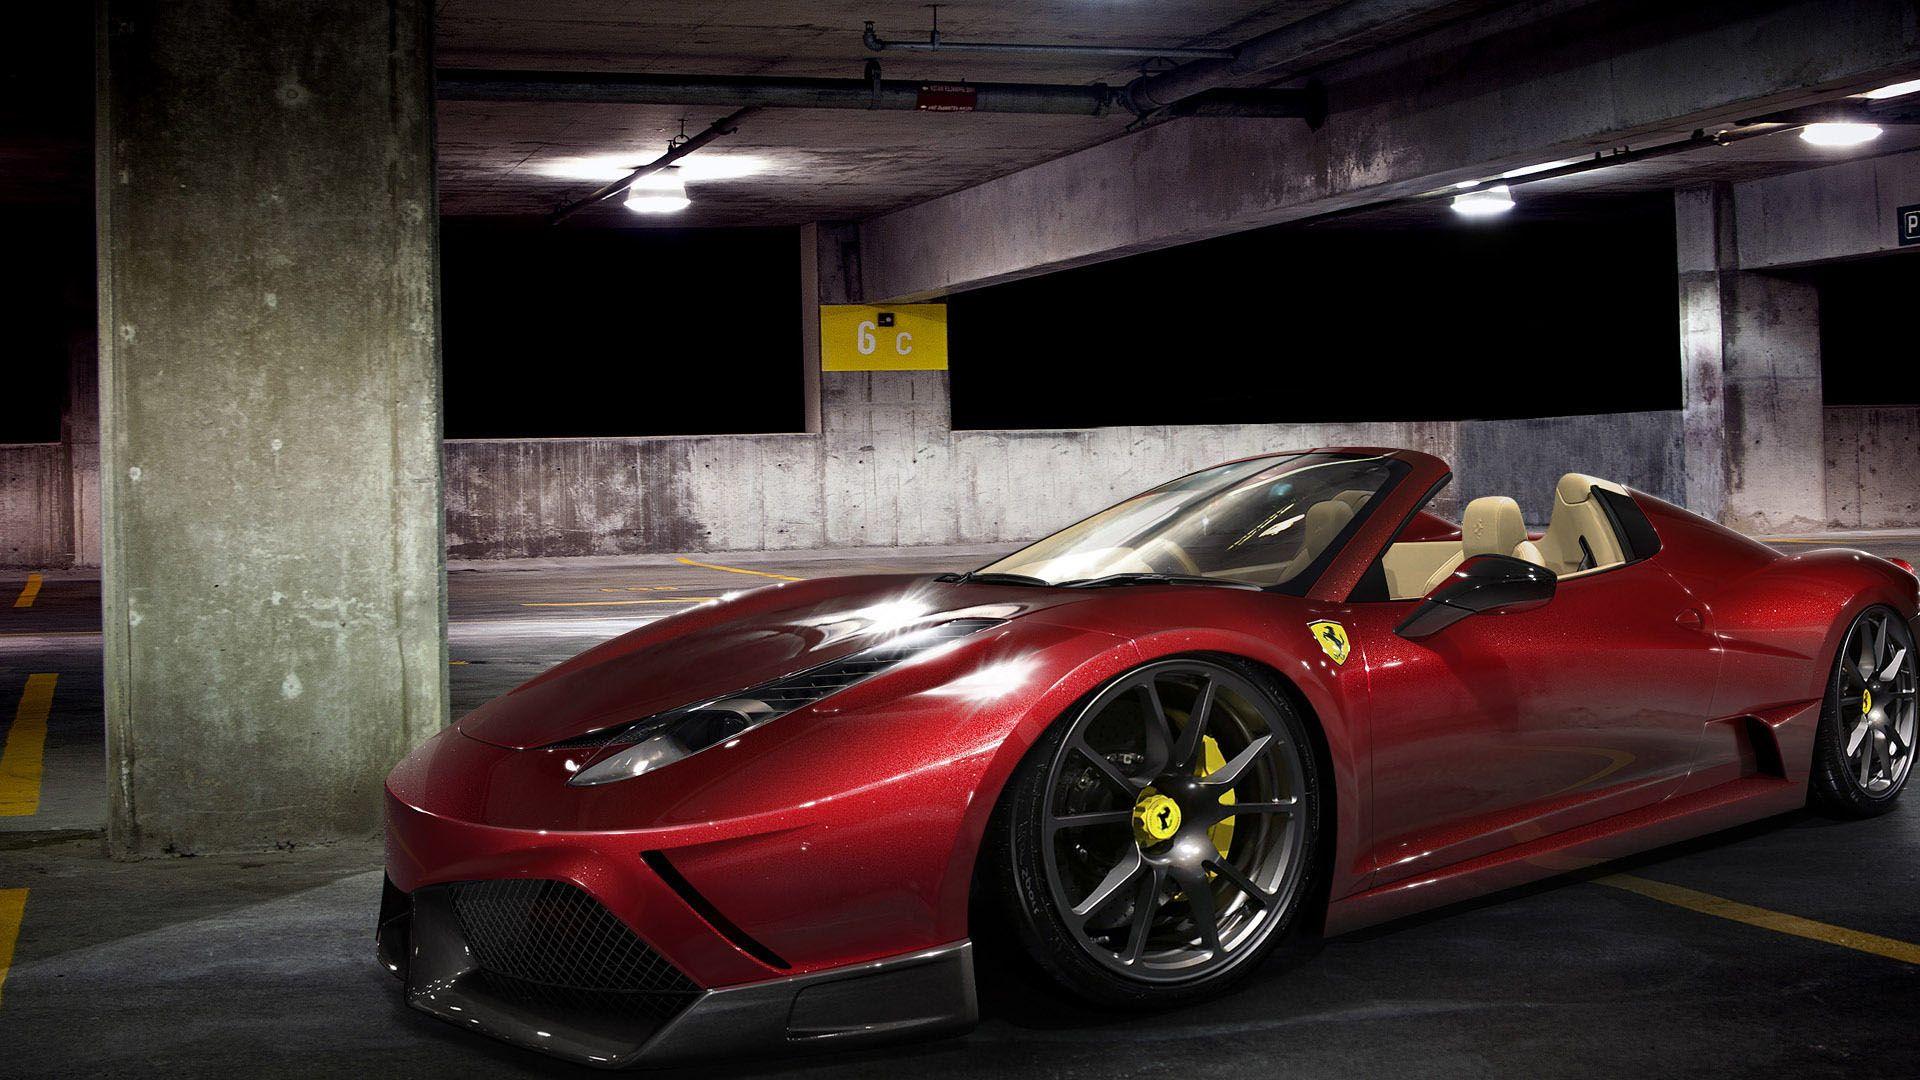 Ferrari 458 Spider Wallpaper Hd 1080p Wallpaper With Images